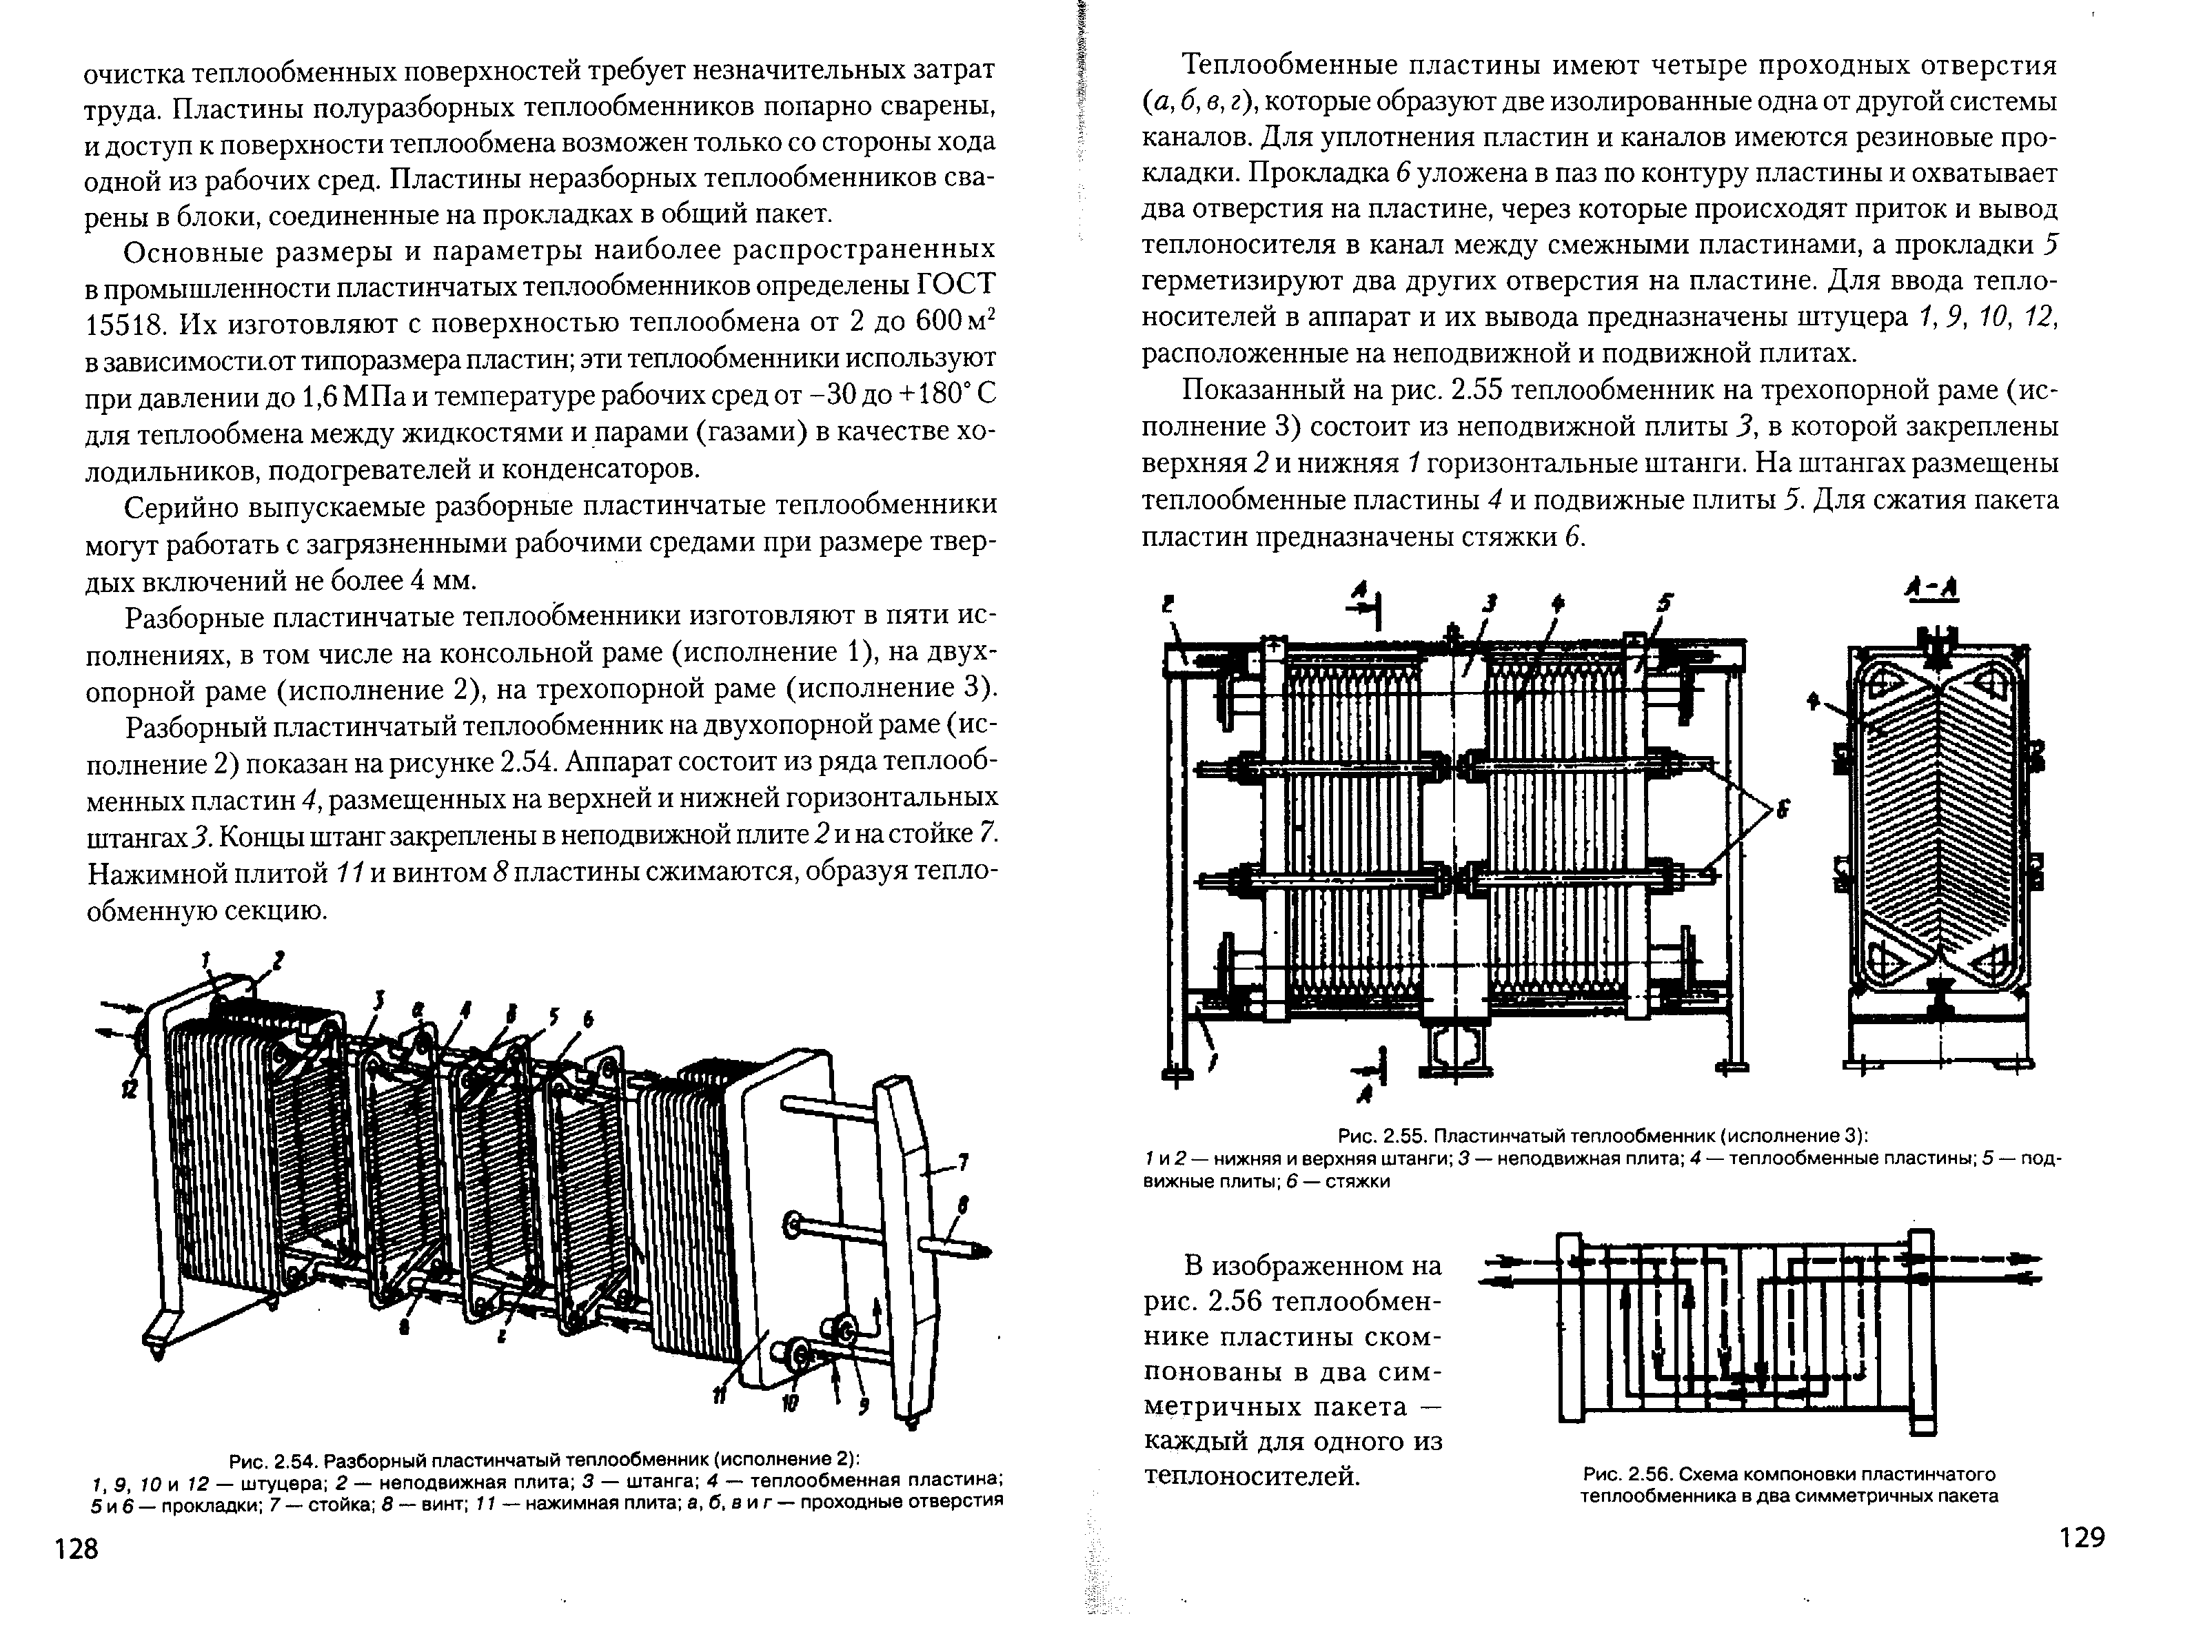 Нажимная плита теплообменника Пластины теплообменника Теплохит ТИ P05 Сарапул